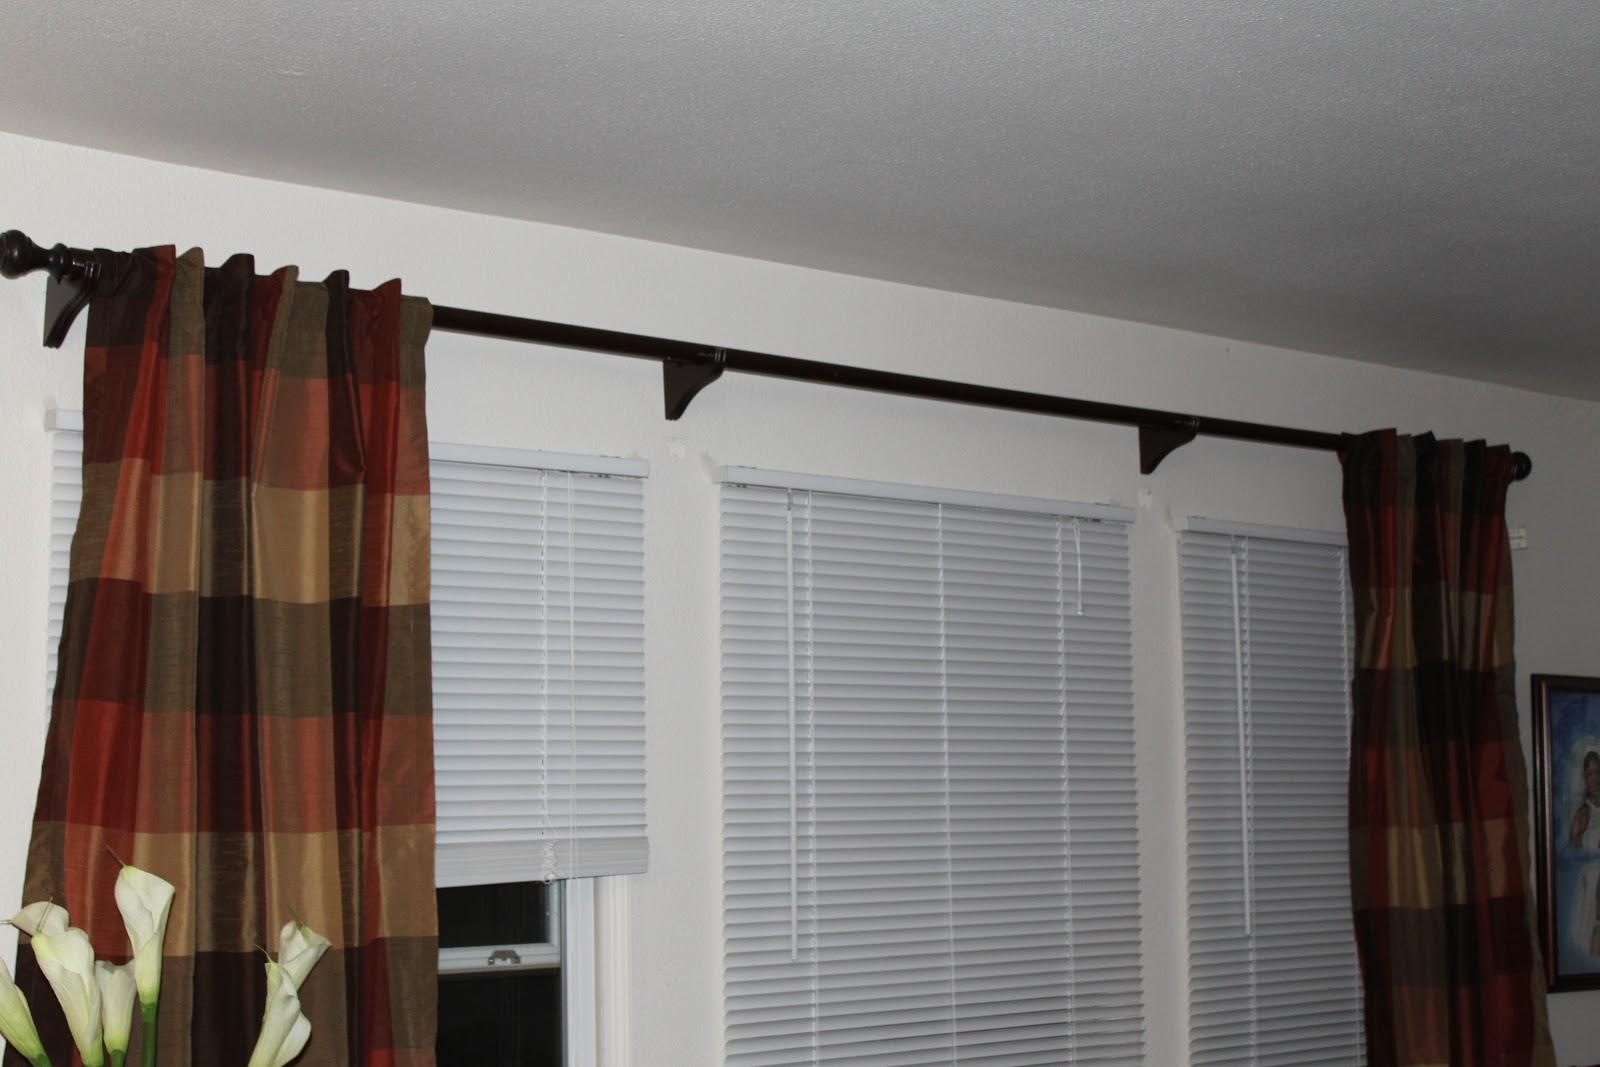 diy diva 75 curtain rod for less than 15 tutorial. Black Bedroom Furniture Sets. Home Design Ideas